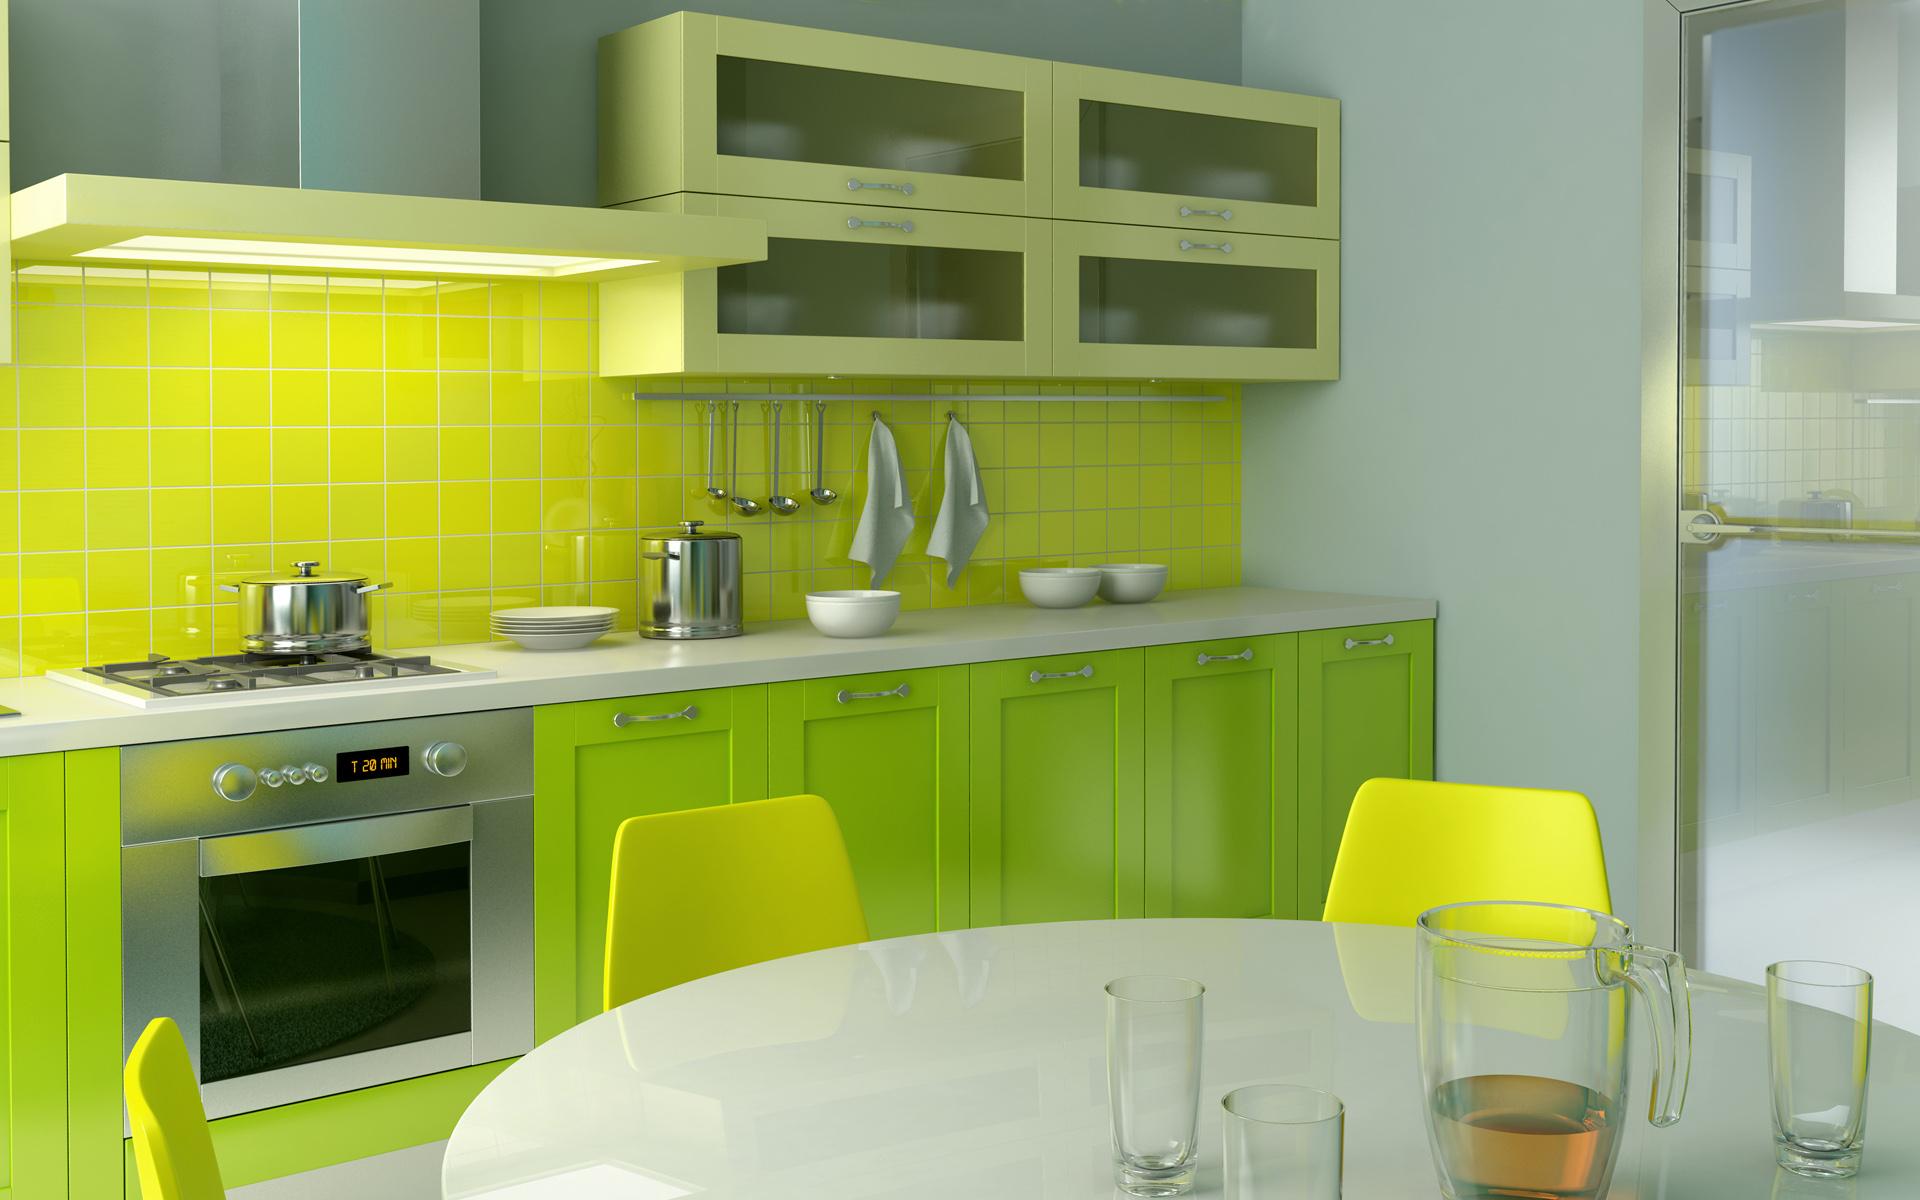 green-kitchen-design-idea green kitchen design idea